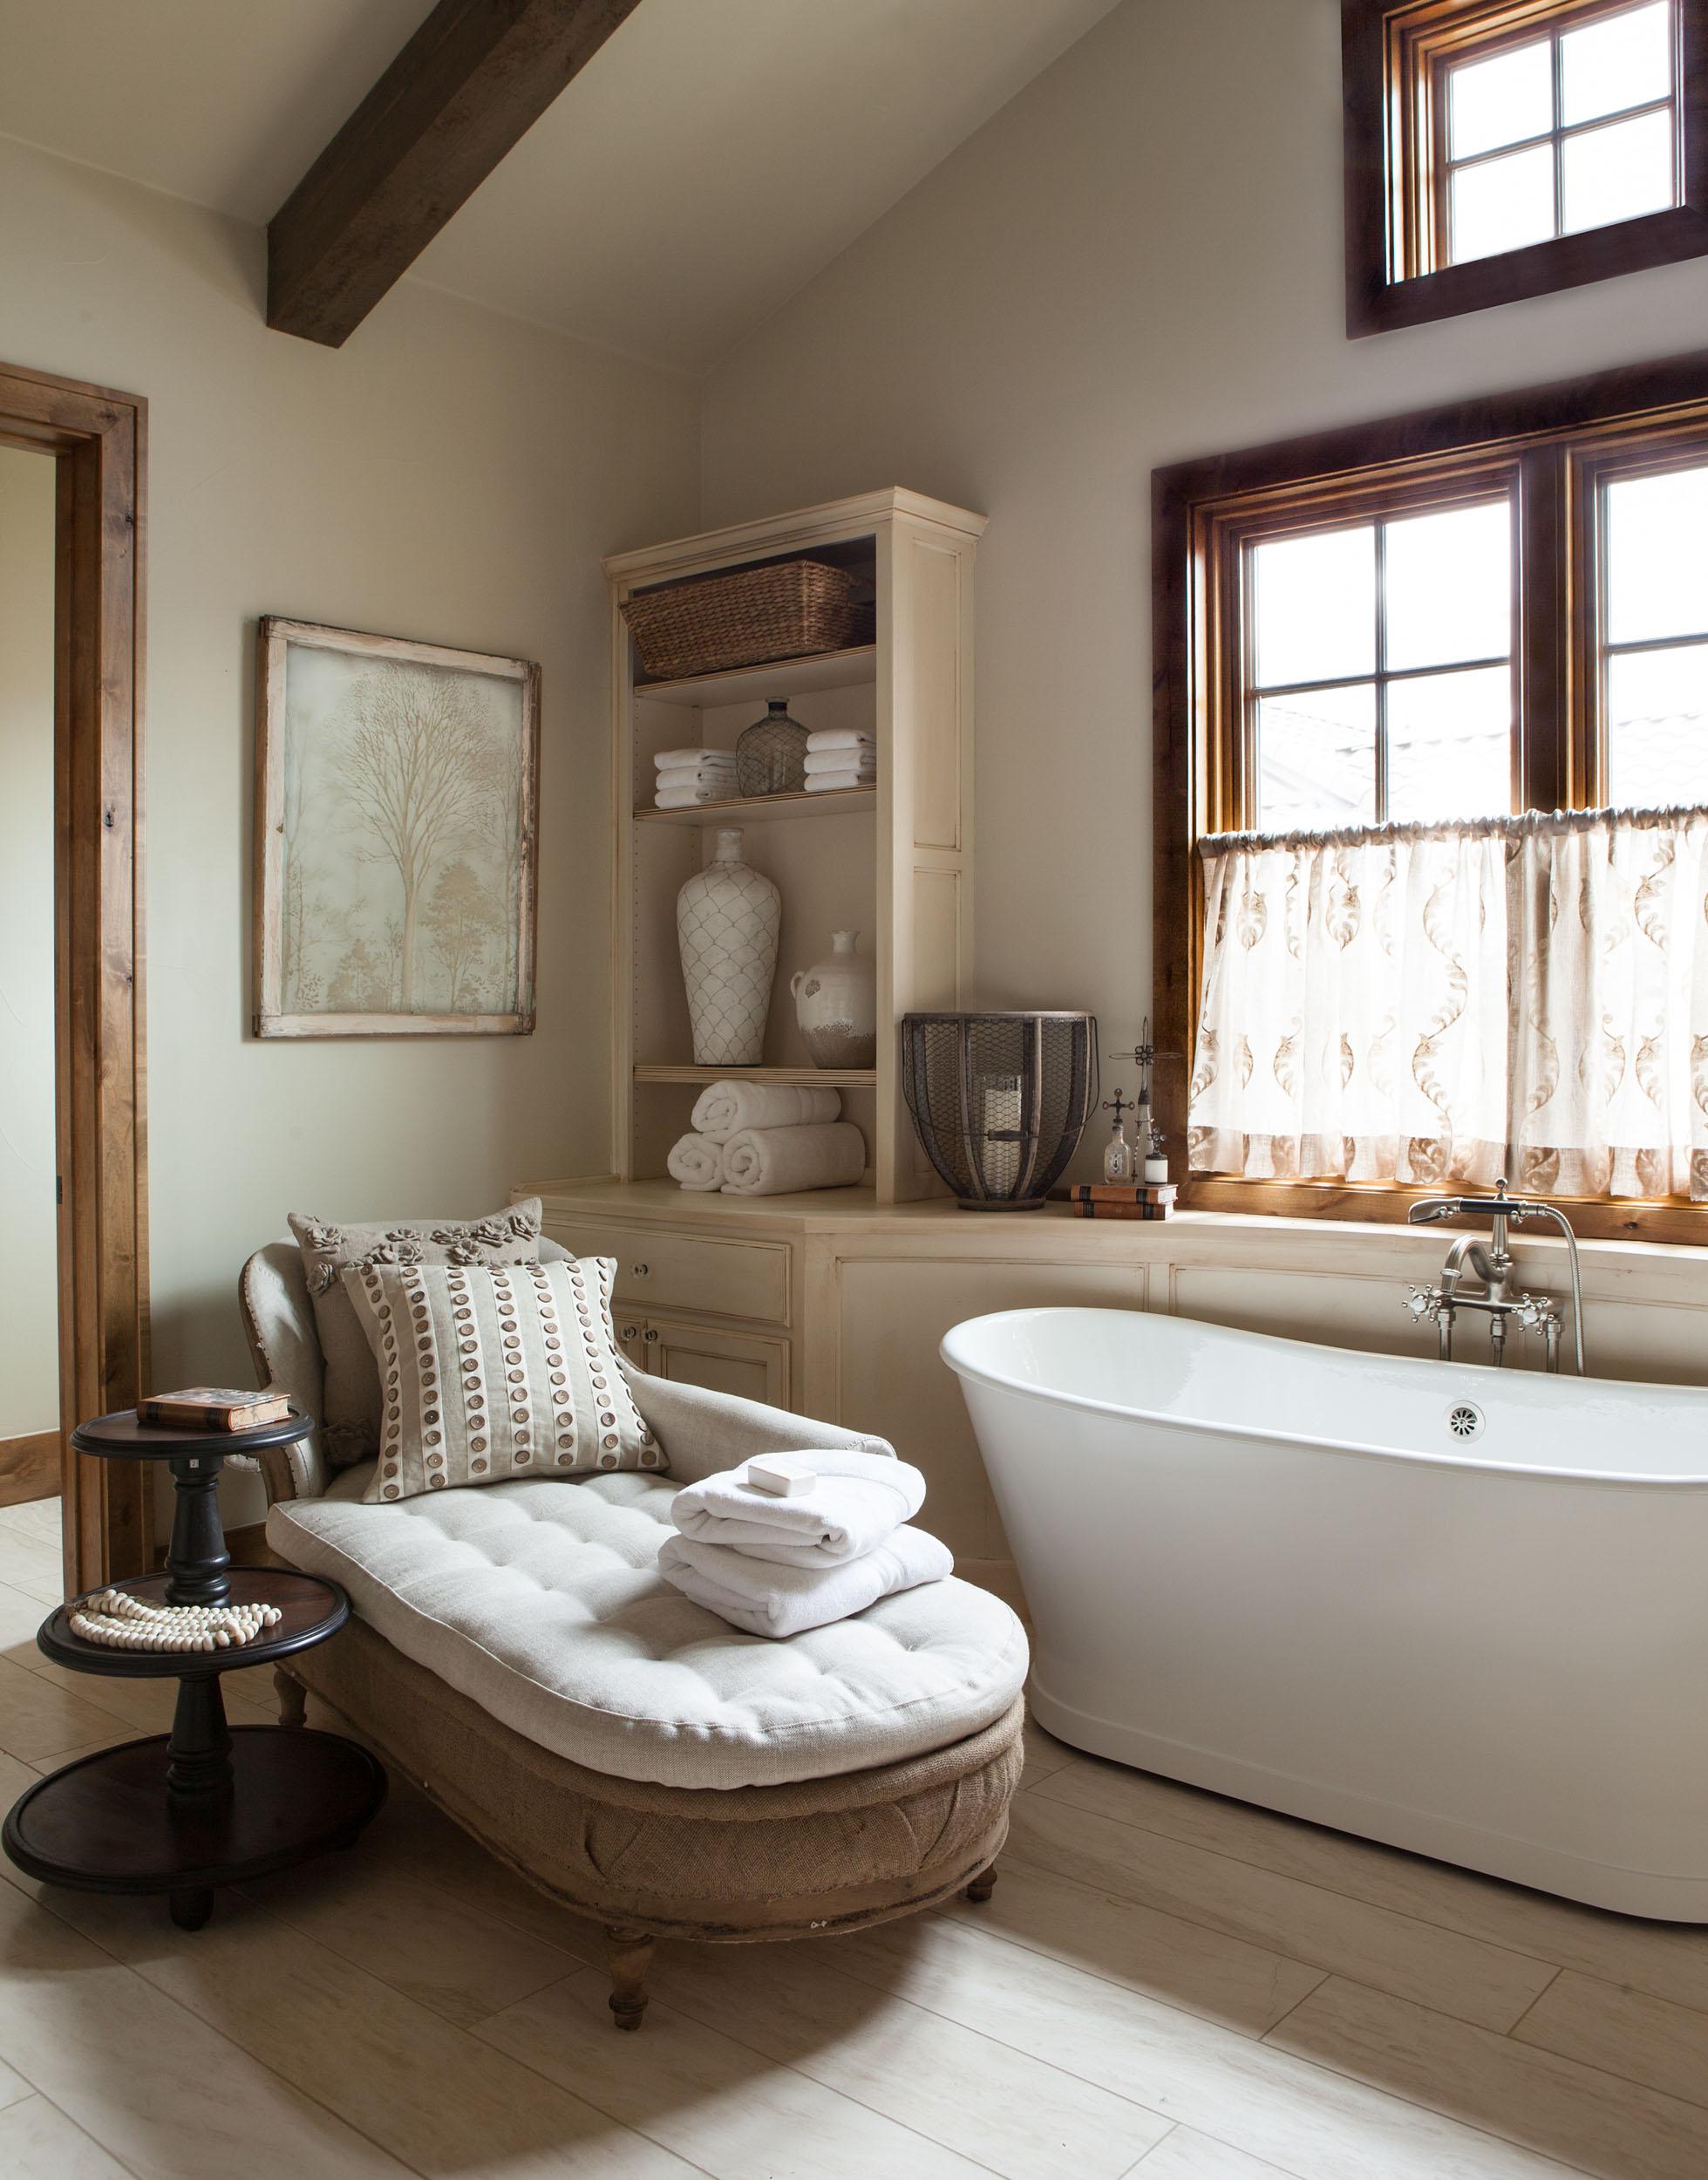 austin-house-master-batheroom-2-interior-design.jpg